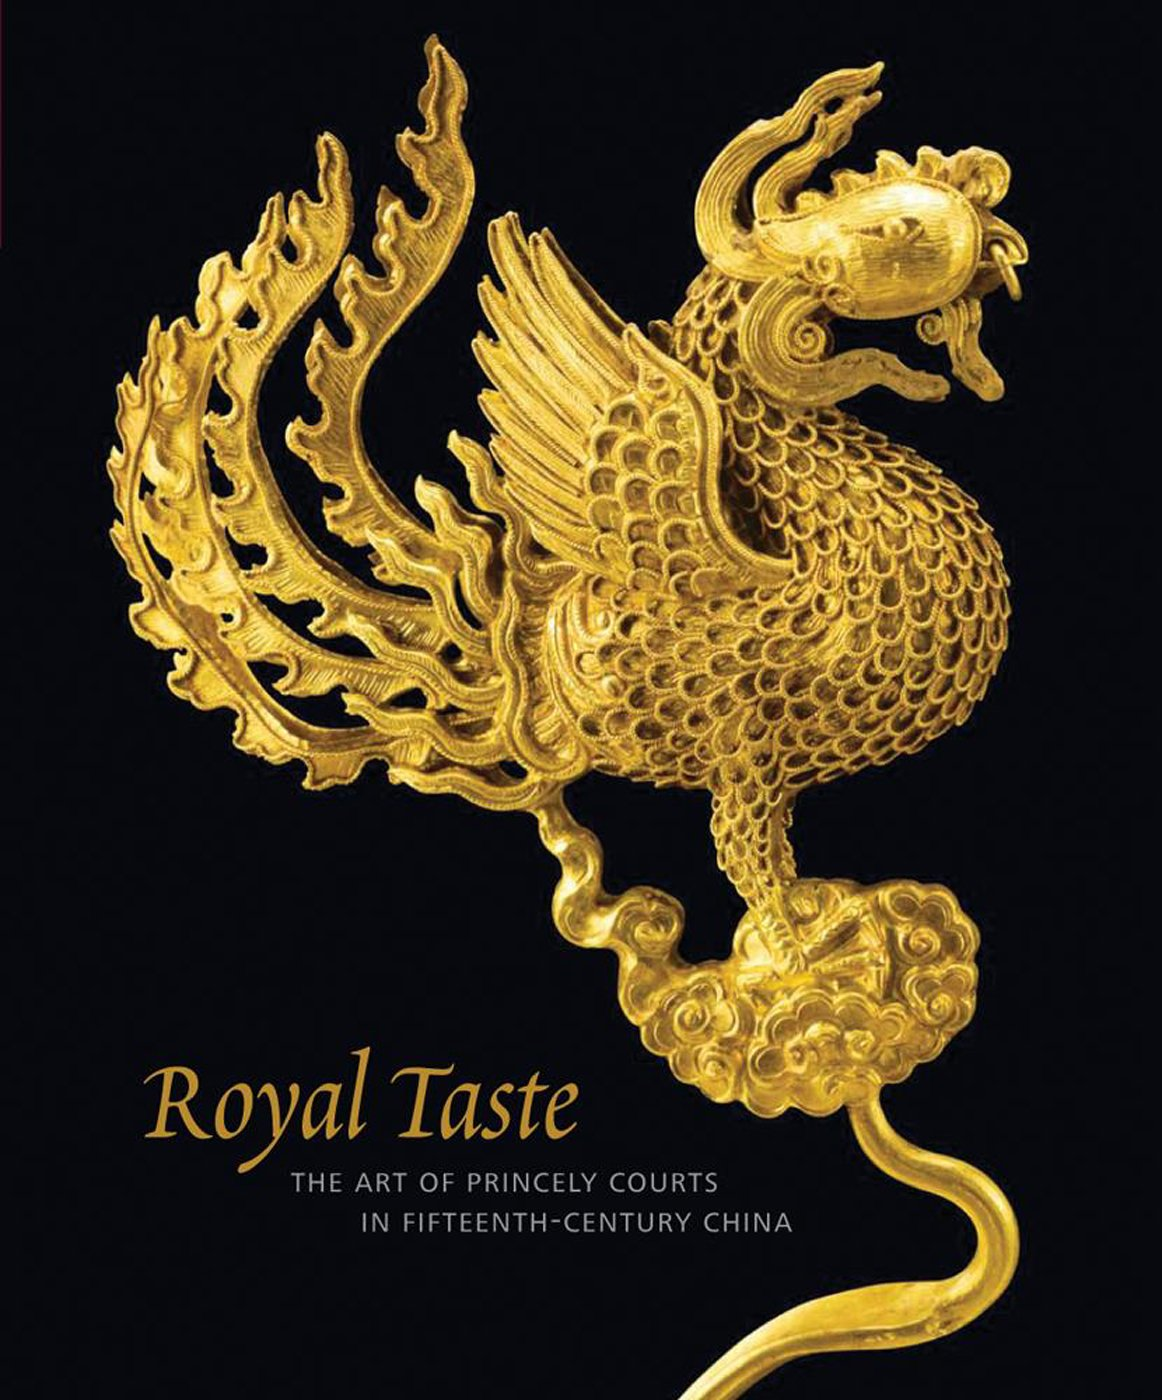 Royal Taste catalogue cover pic.jpg